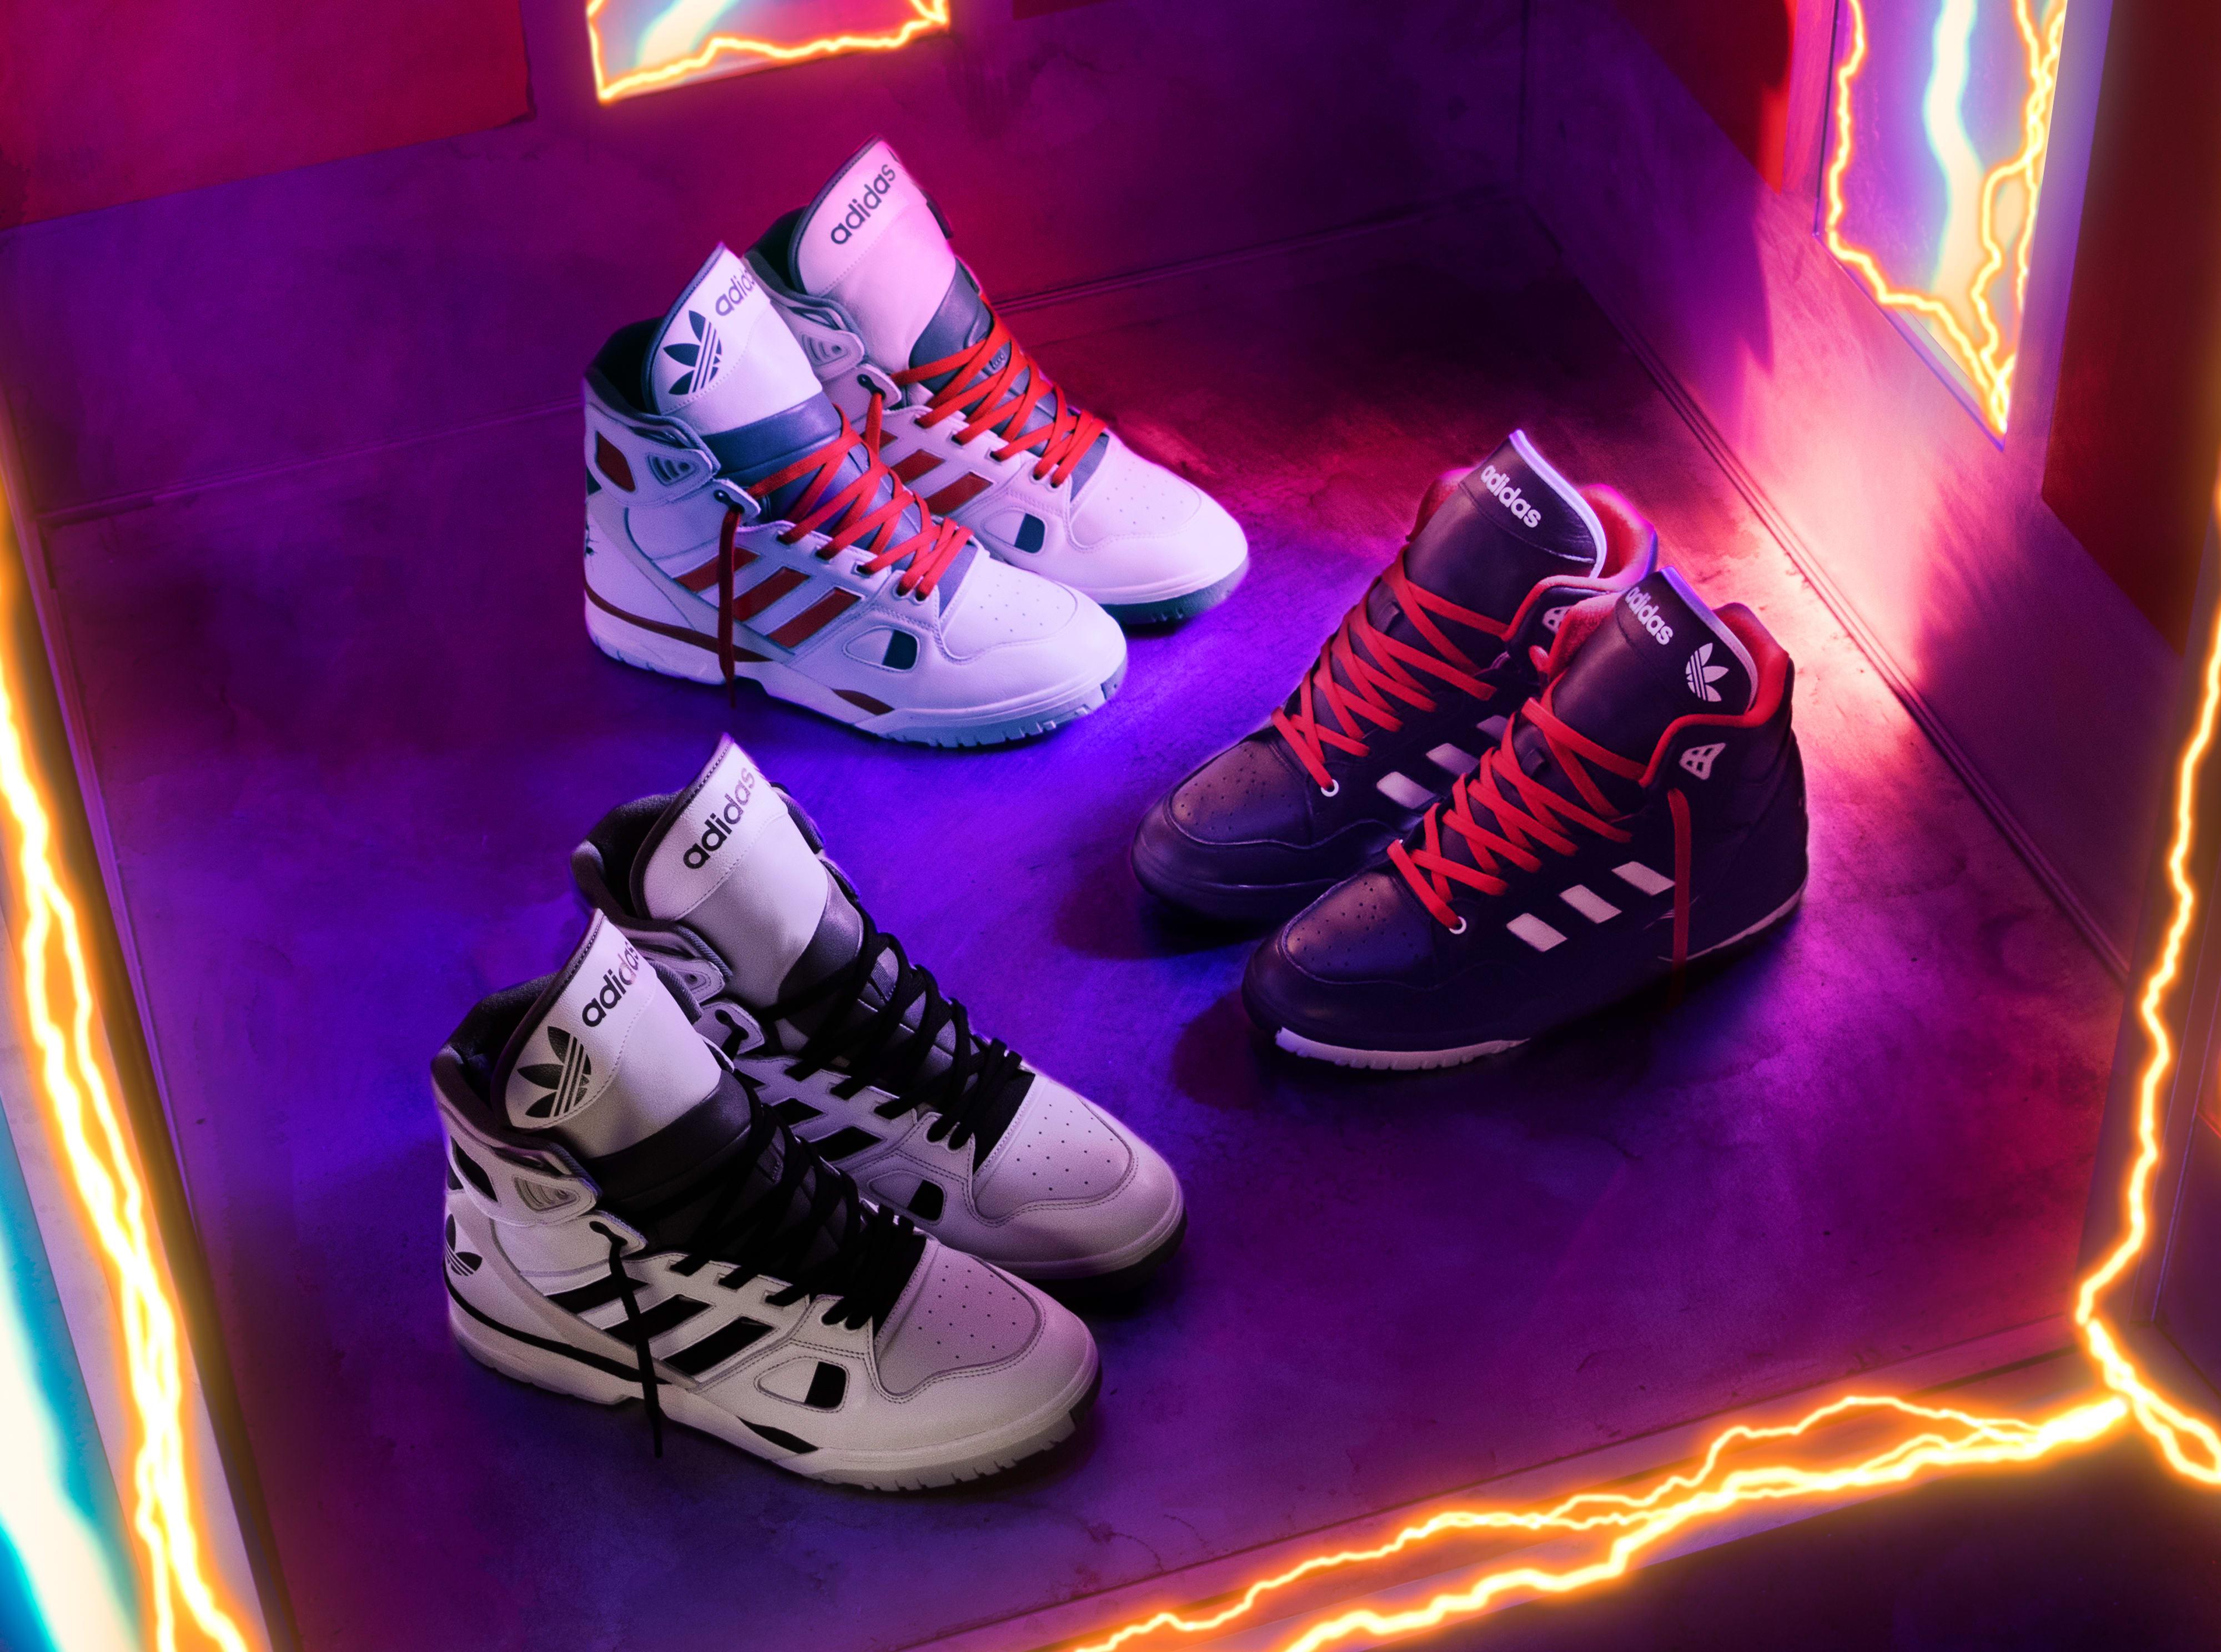 Kid Cudi x Adidas Originals Artillery Hi 'Bill and Ted' Collection